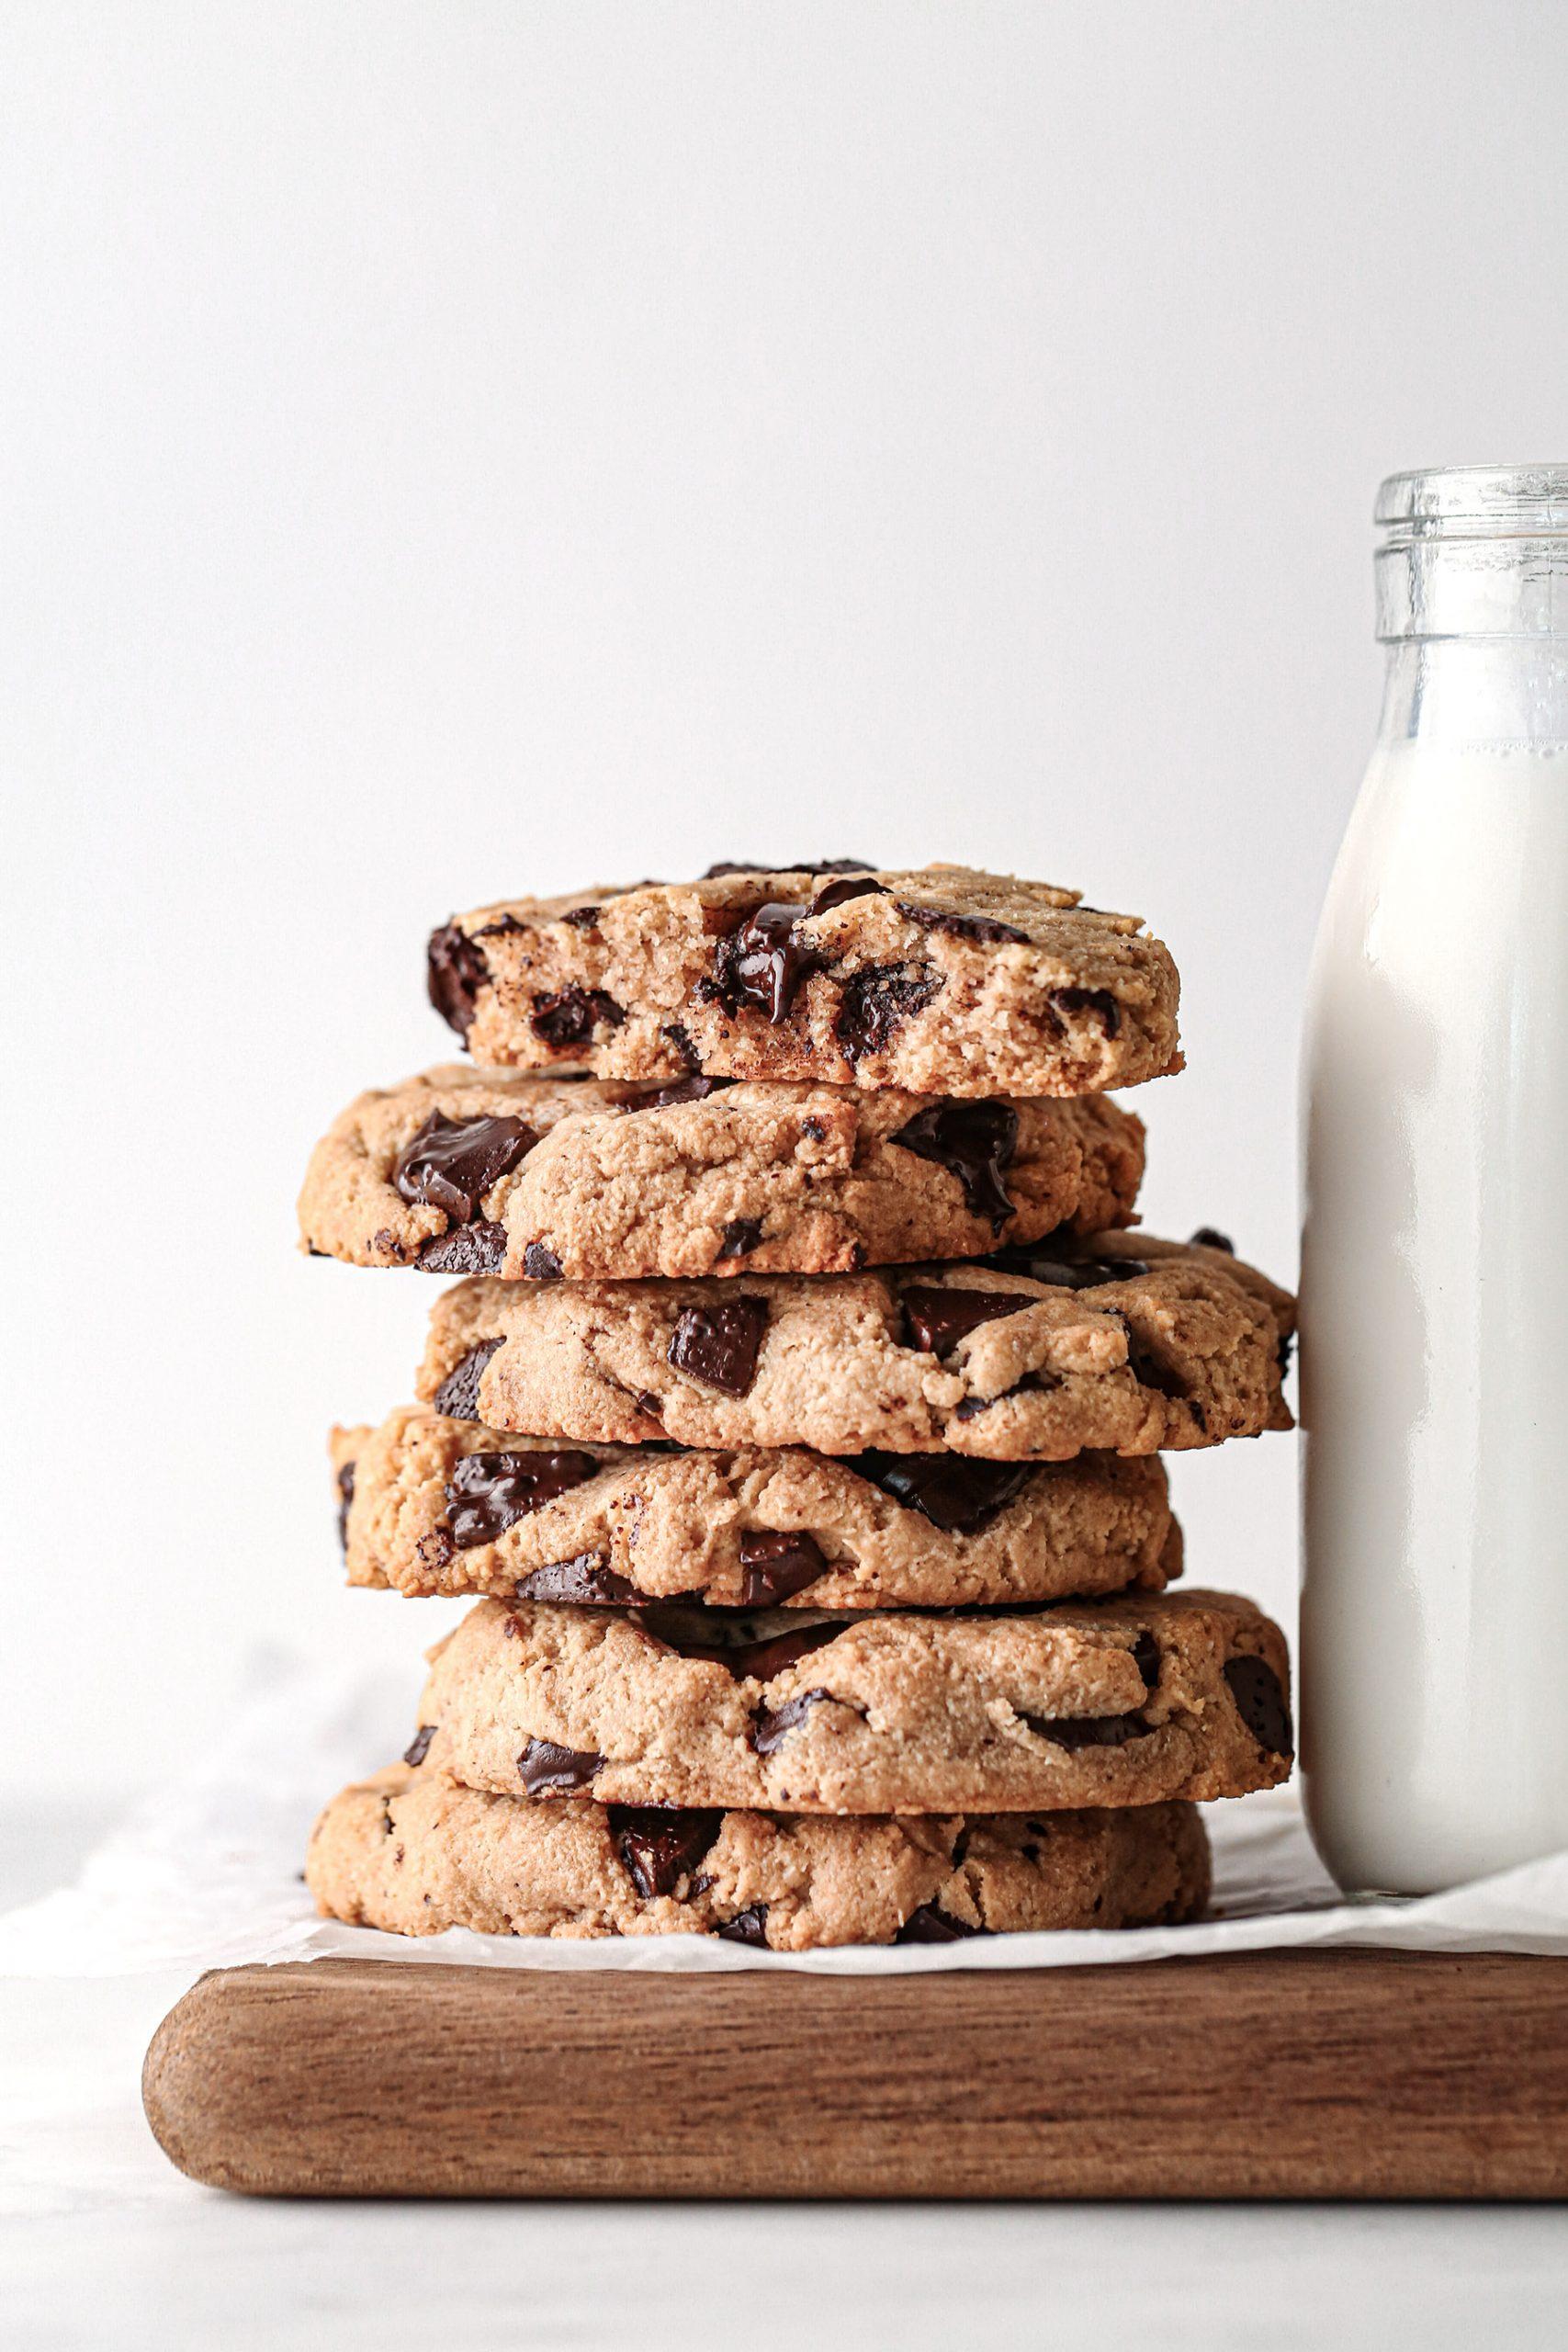 Vegan Gluten-Free Chocolate Chip Cookies